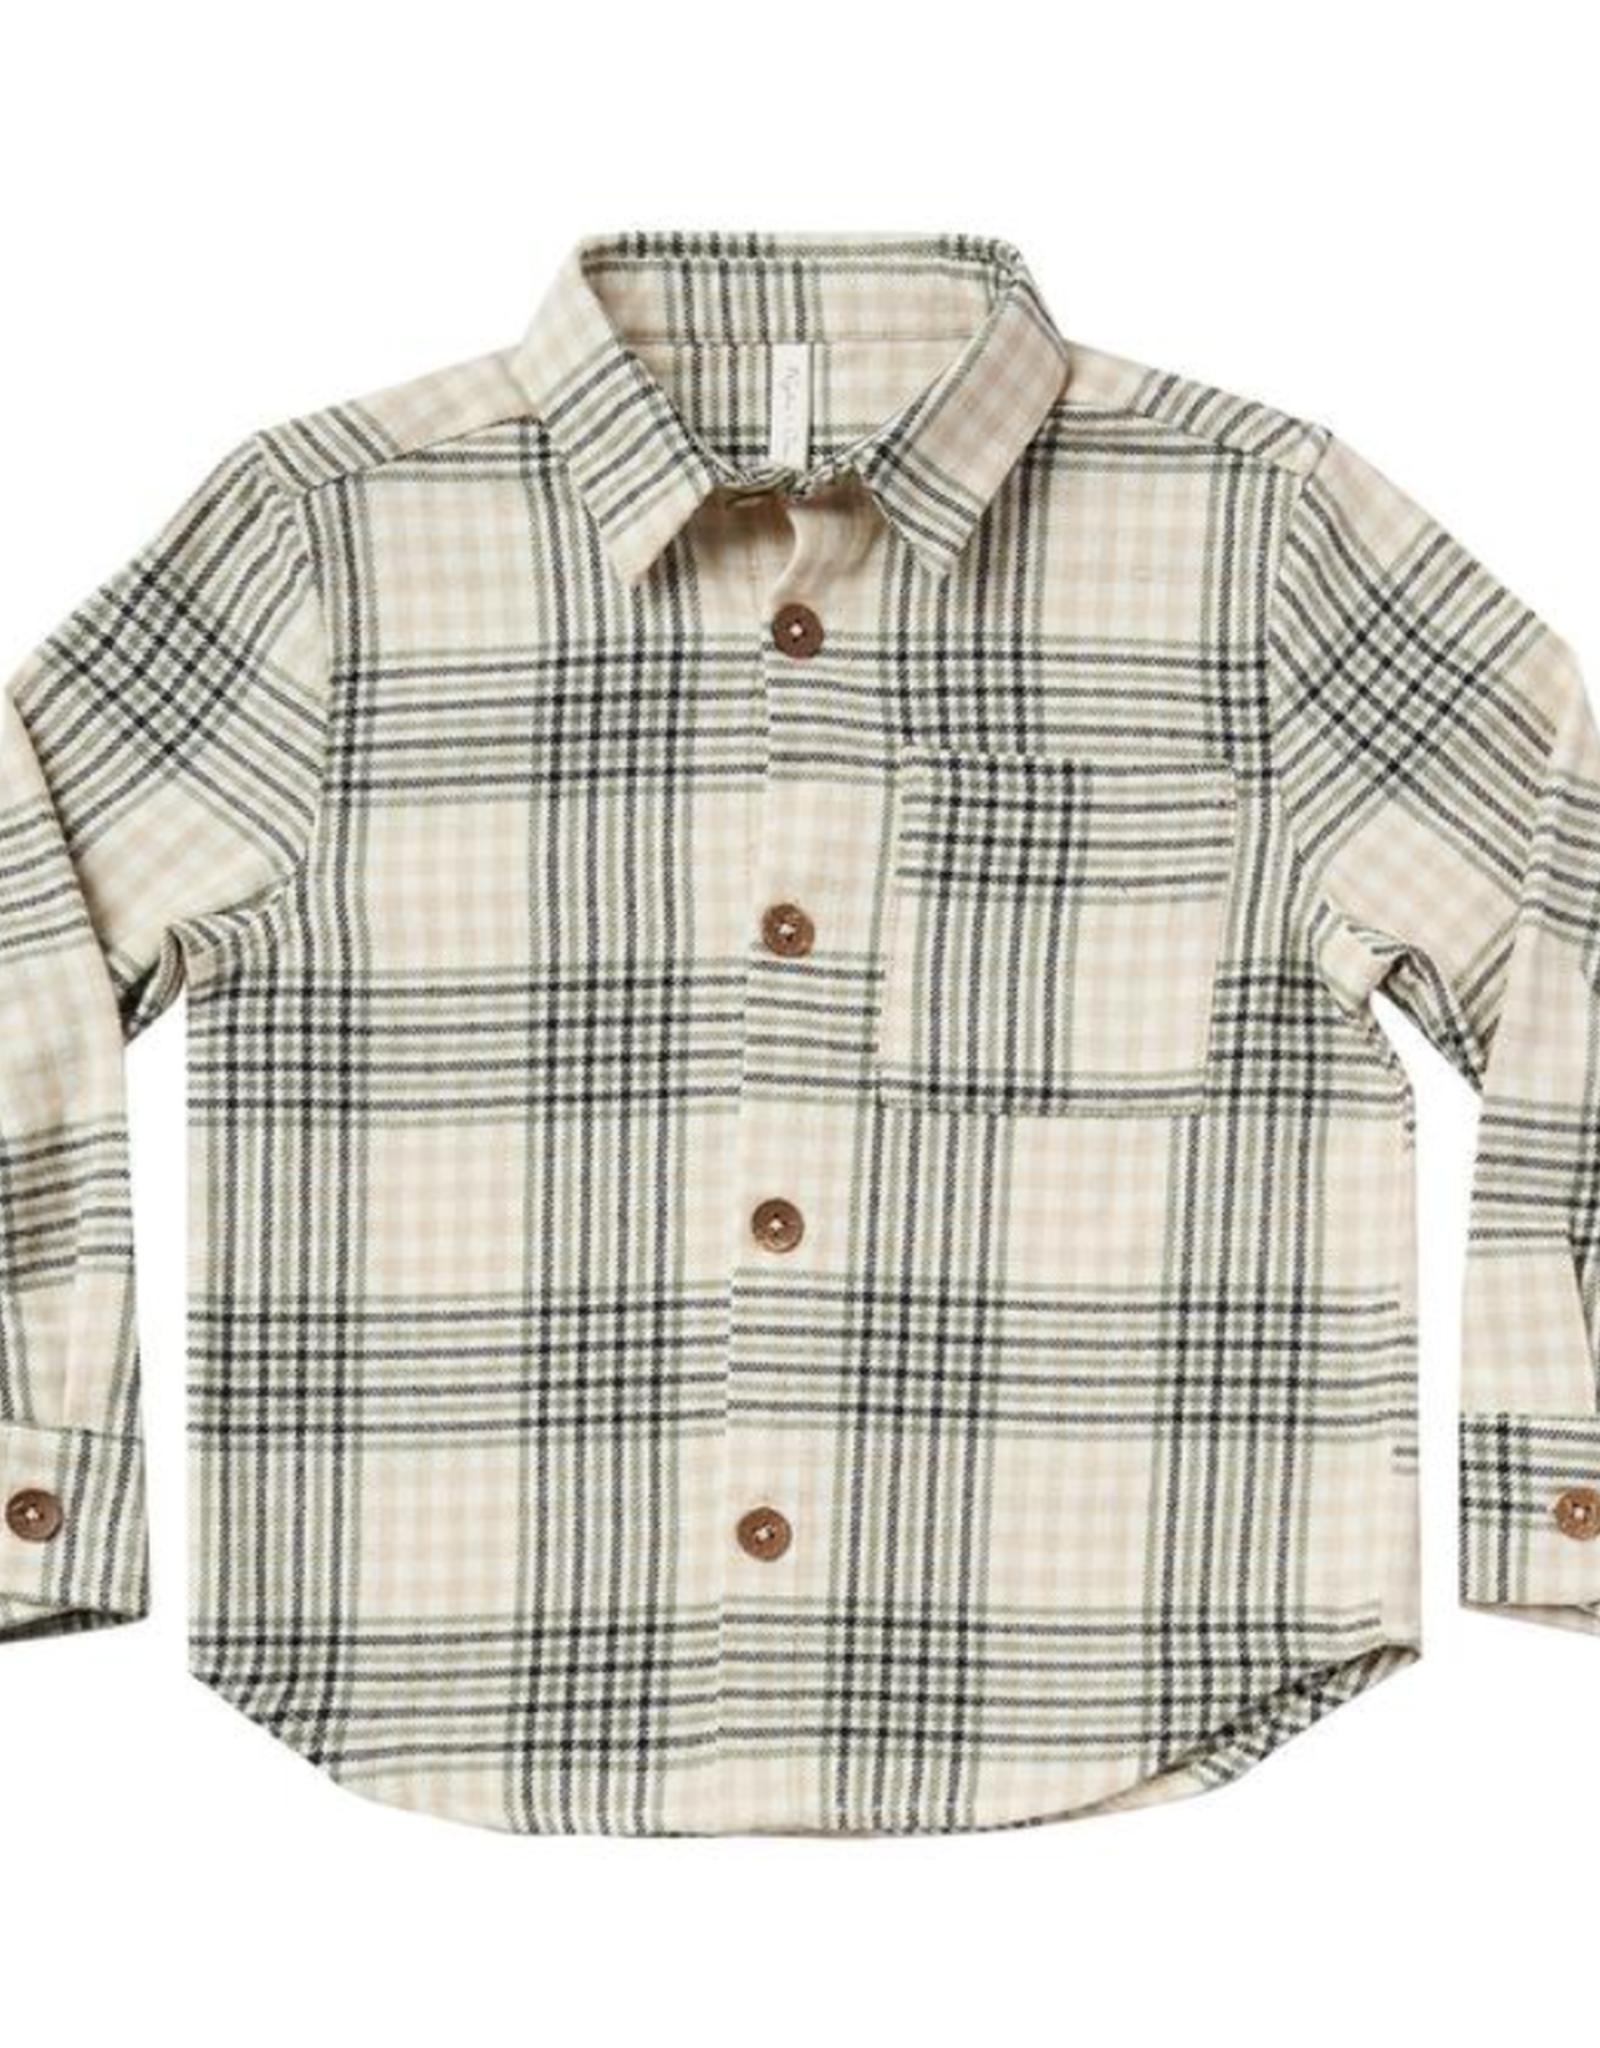 Rylee + Cru Rylee + Cru - Collared Shirt